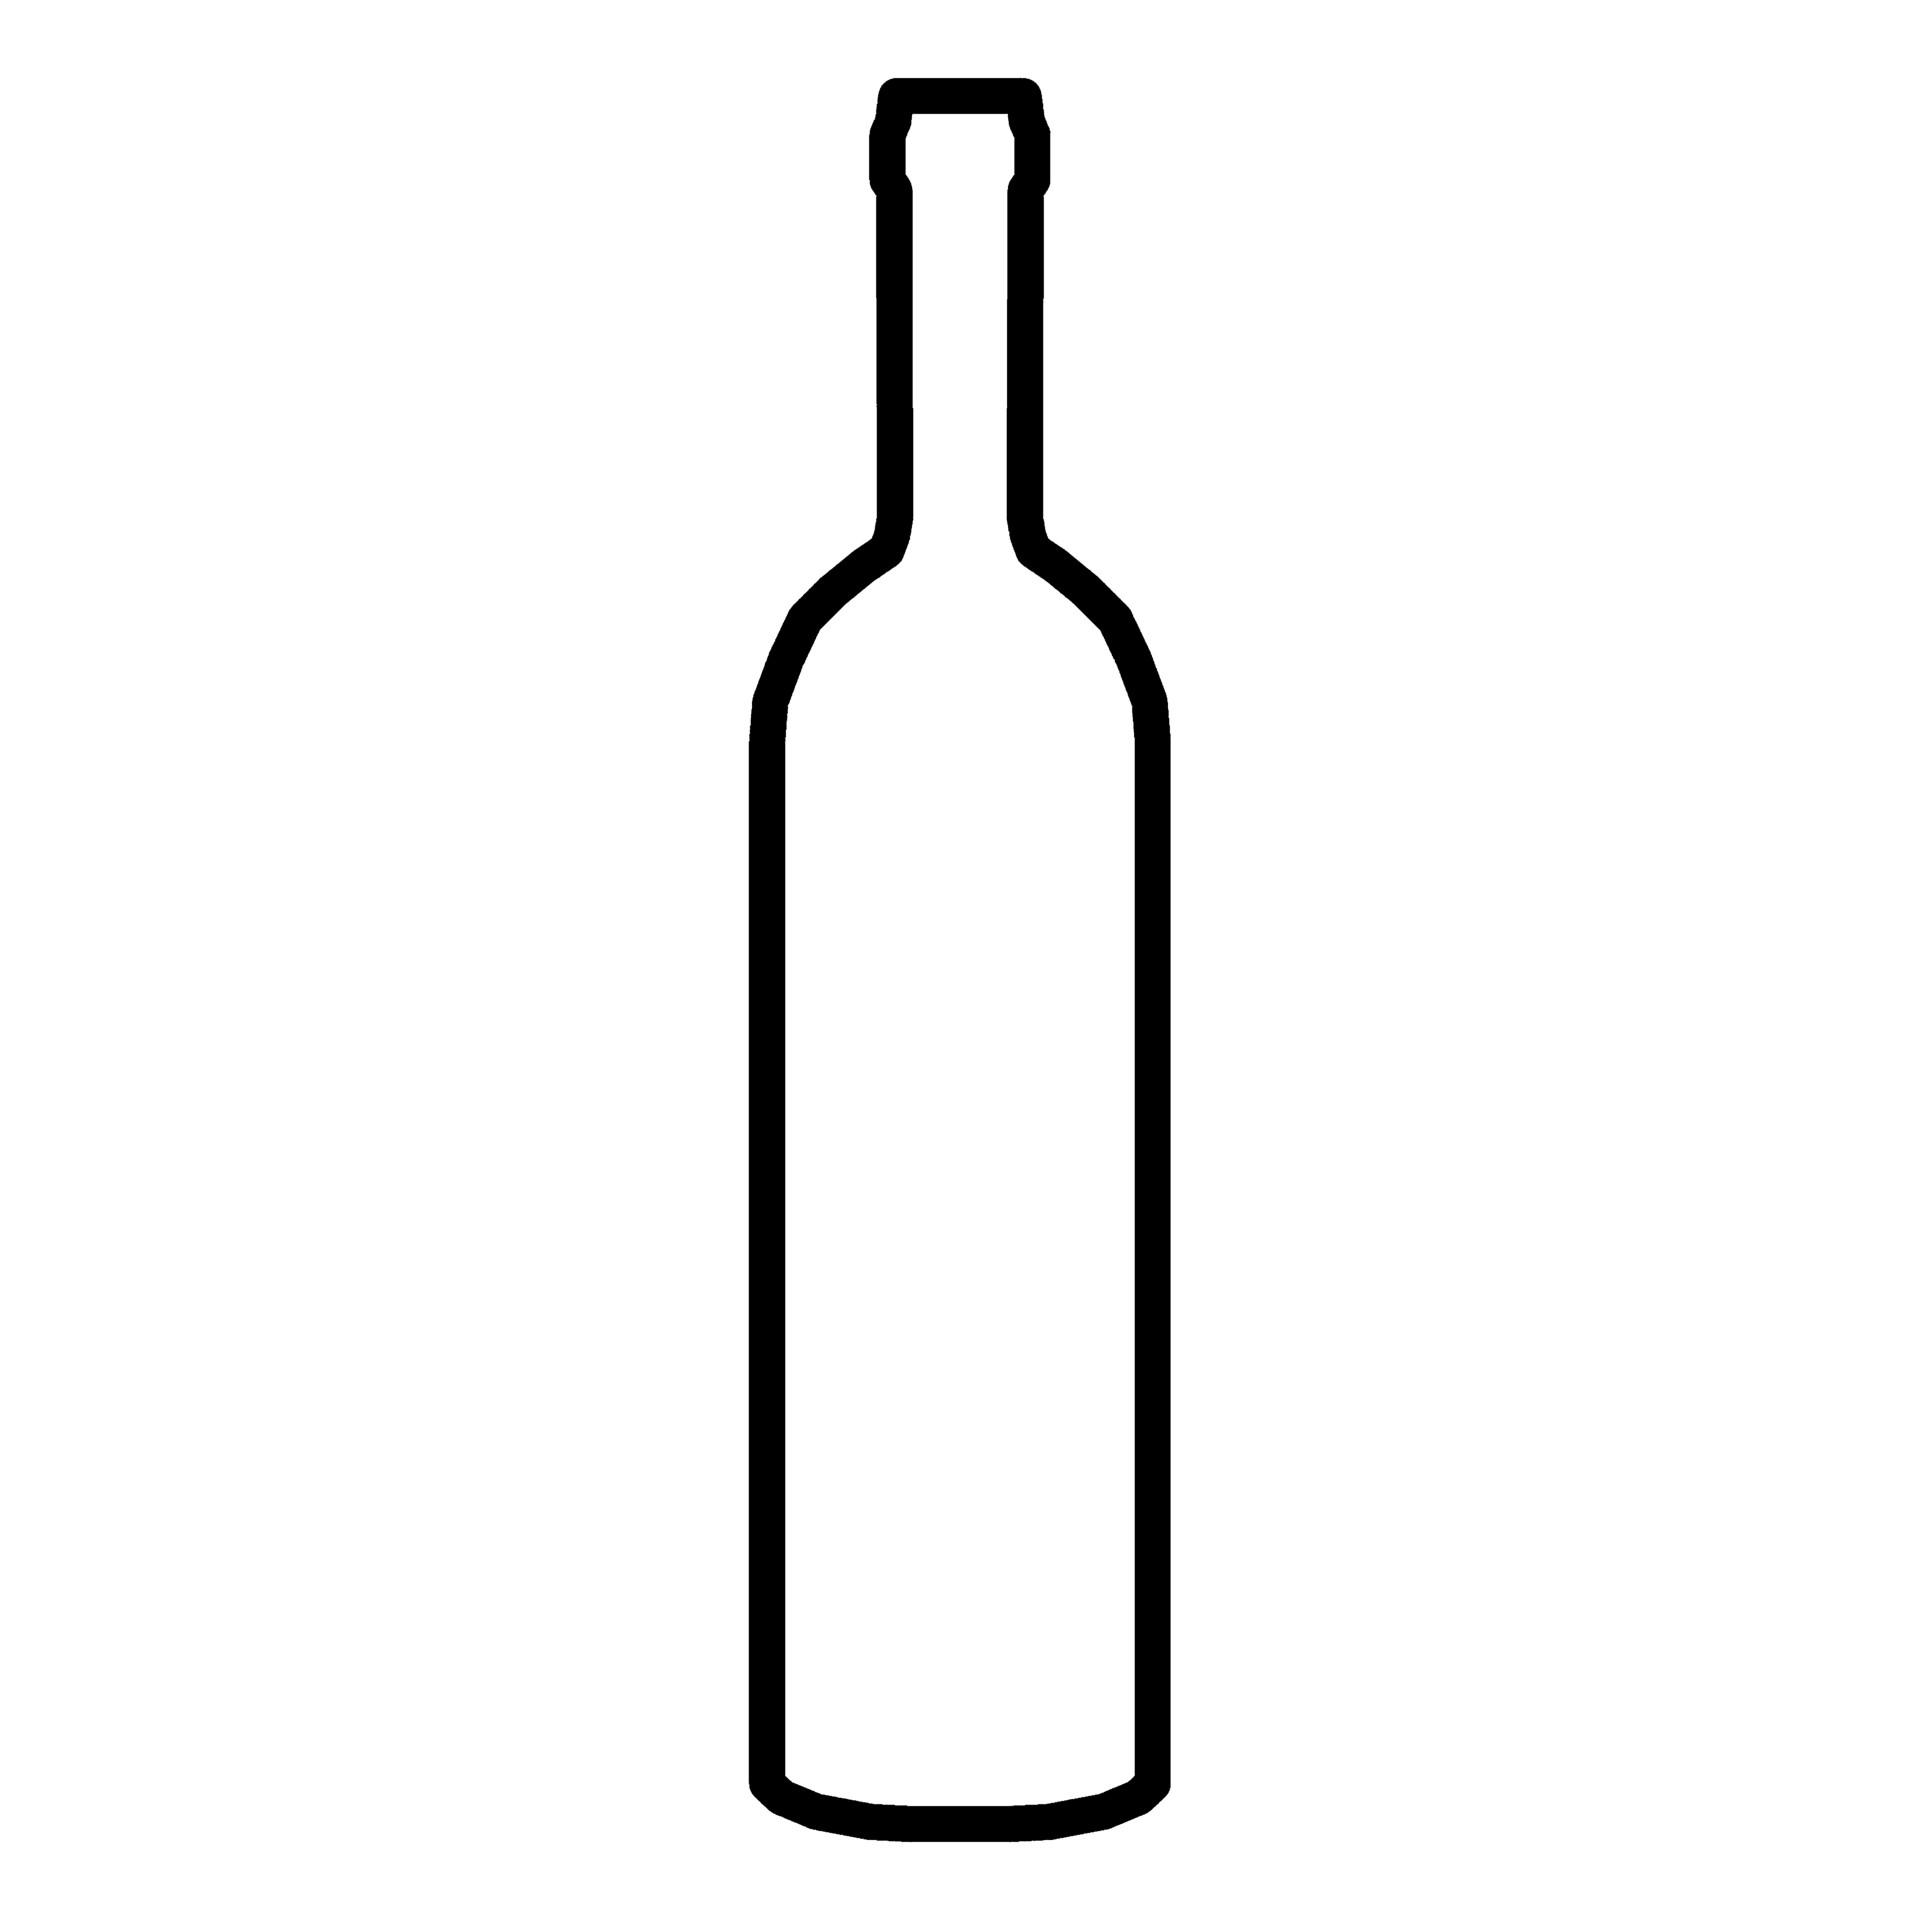 Wine Bottle Silhouette Vector At Getdrawings